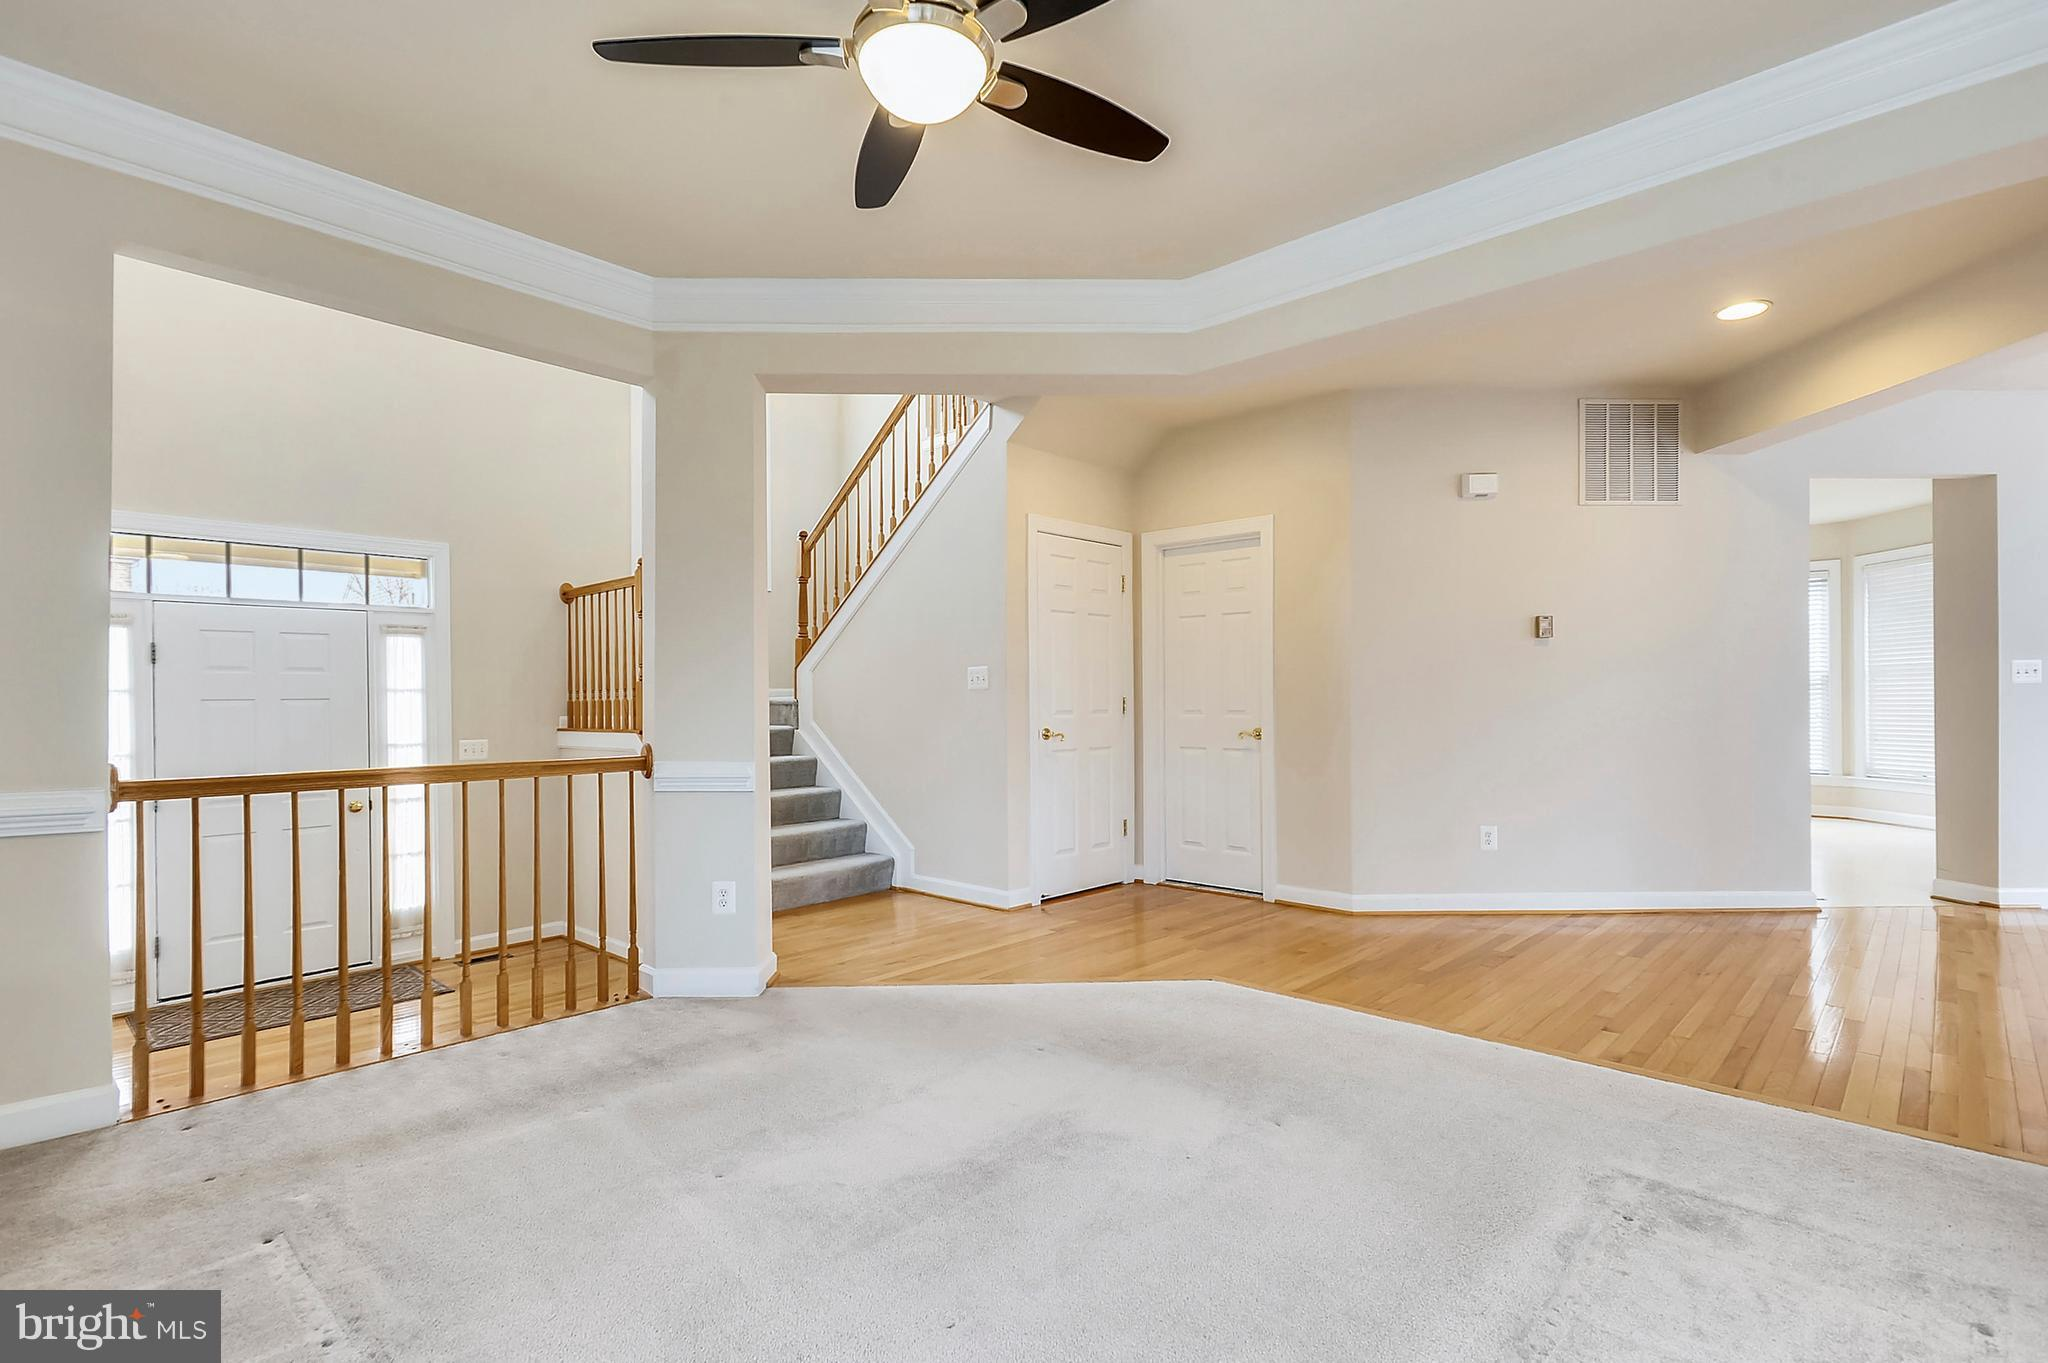 CHICKASAW PLACE NE Leesburg VA SOLD LISTING MLS - Chickasaw brand hardwood flooring